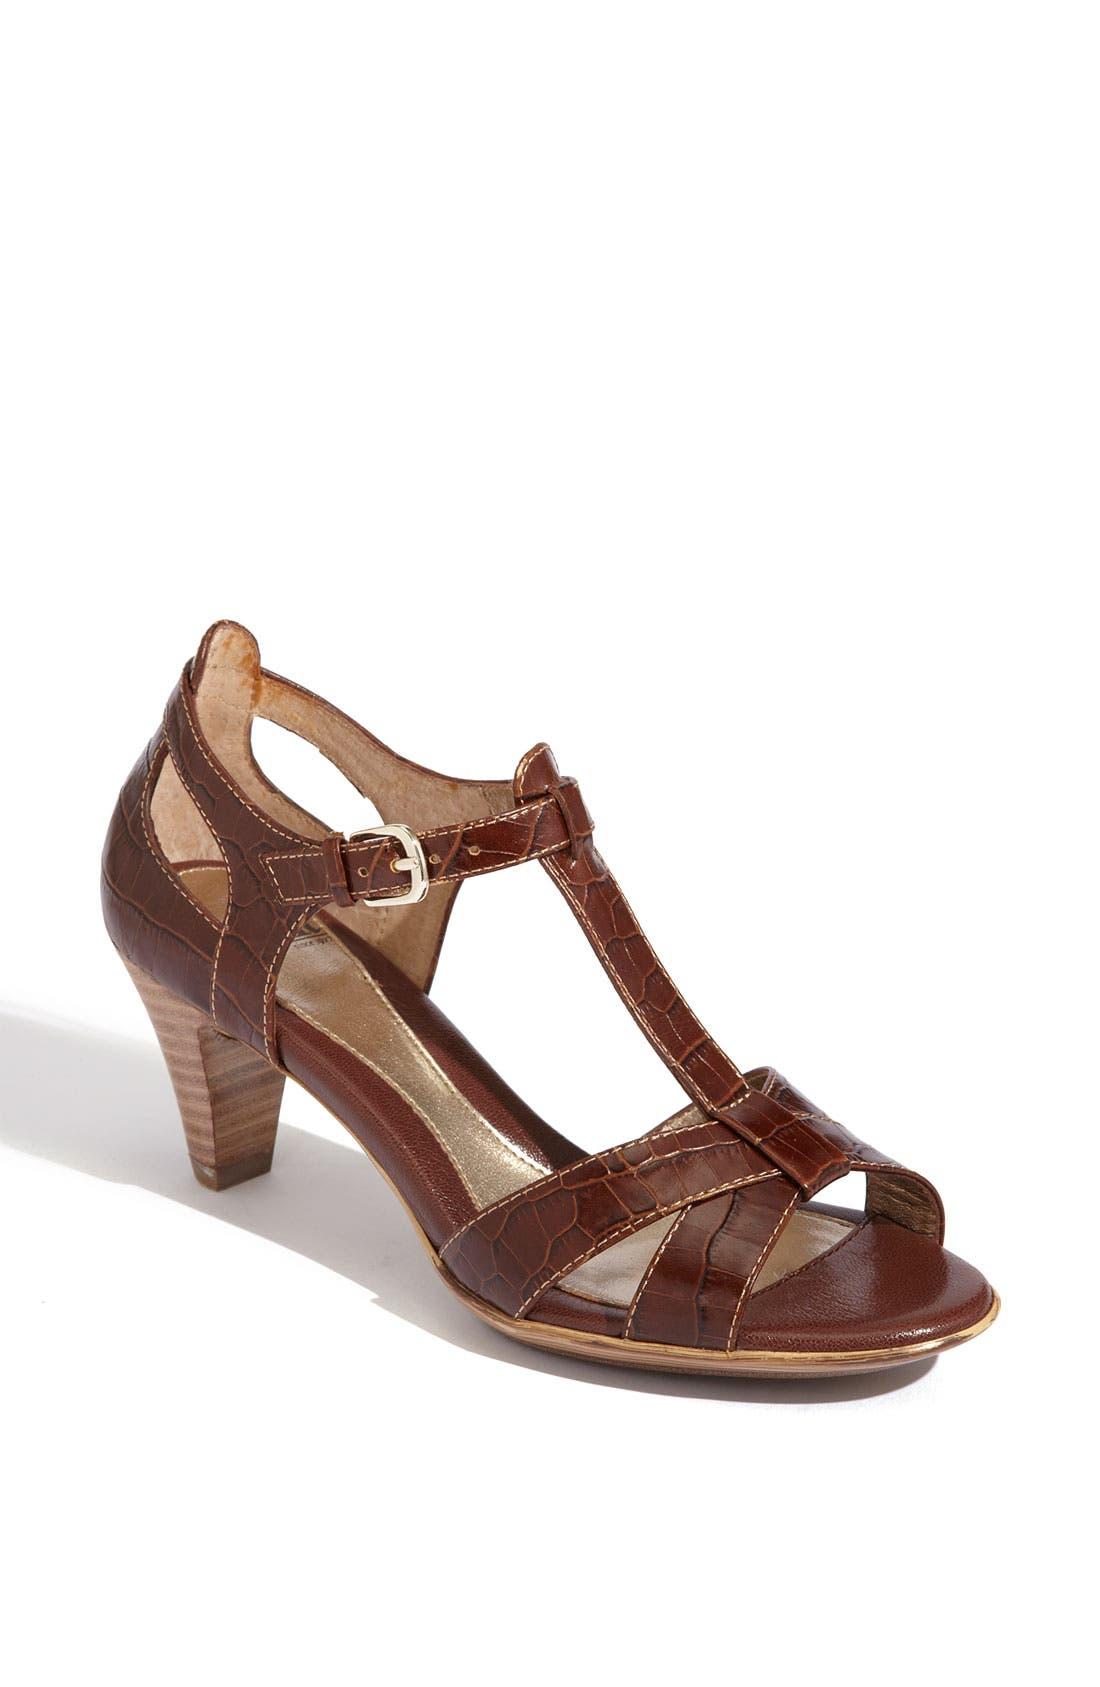 Alternate Image 1 Selected - Söfft 'Amble' Sandal